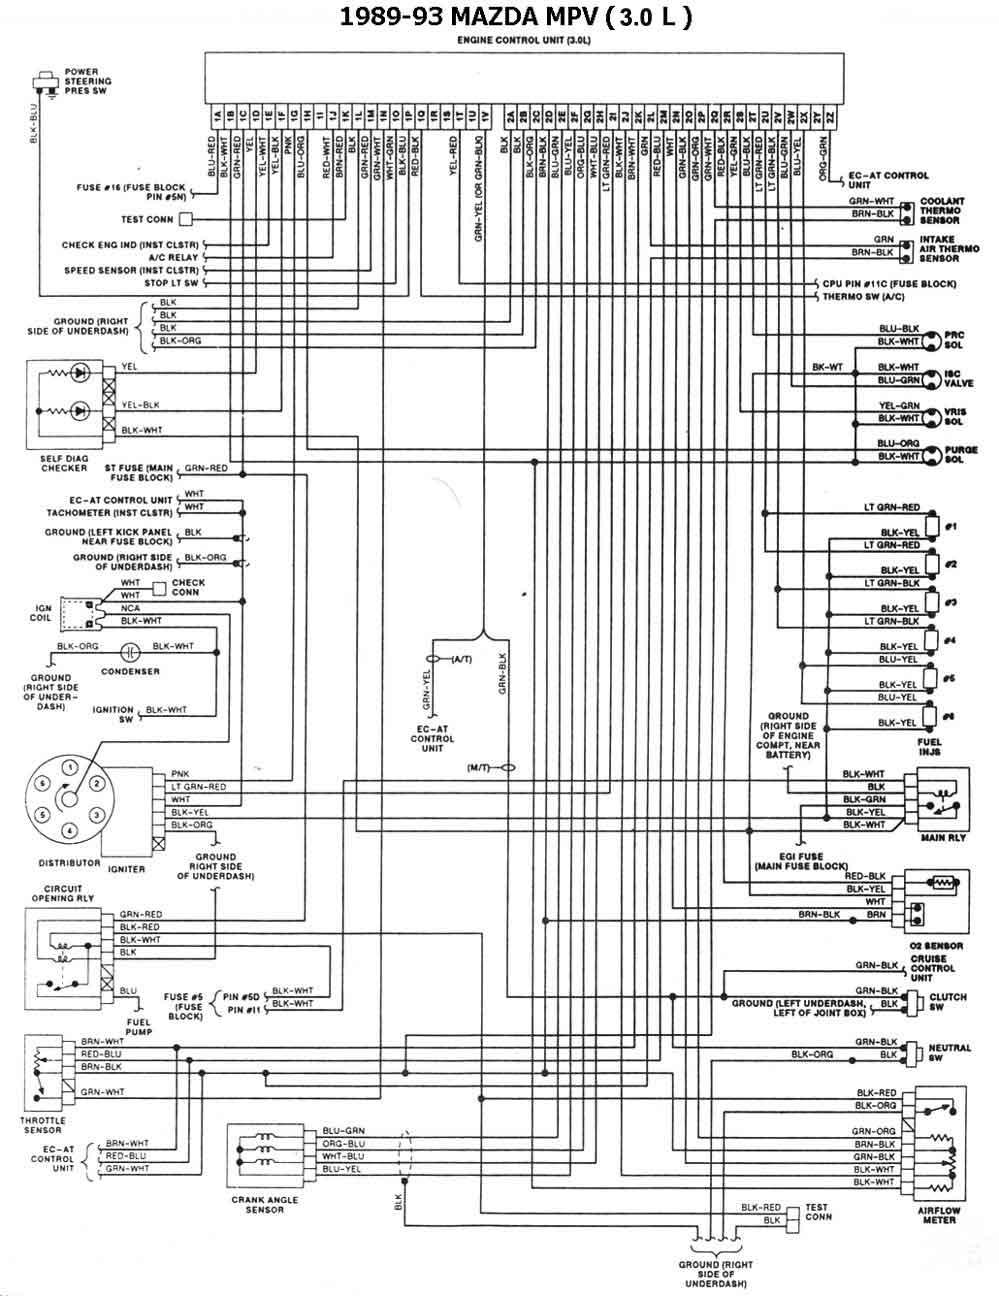 hight resolution of 1989 93 mpv 3 0l mazda